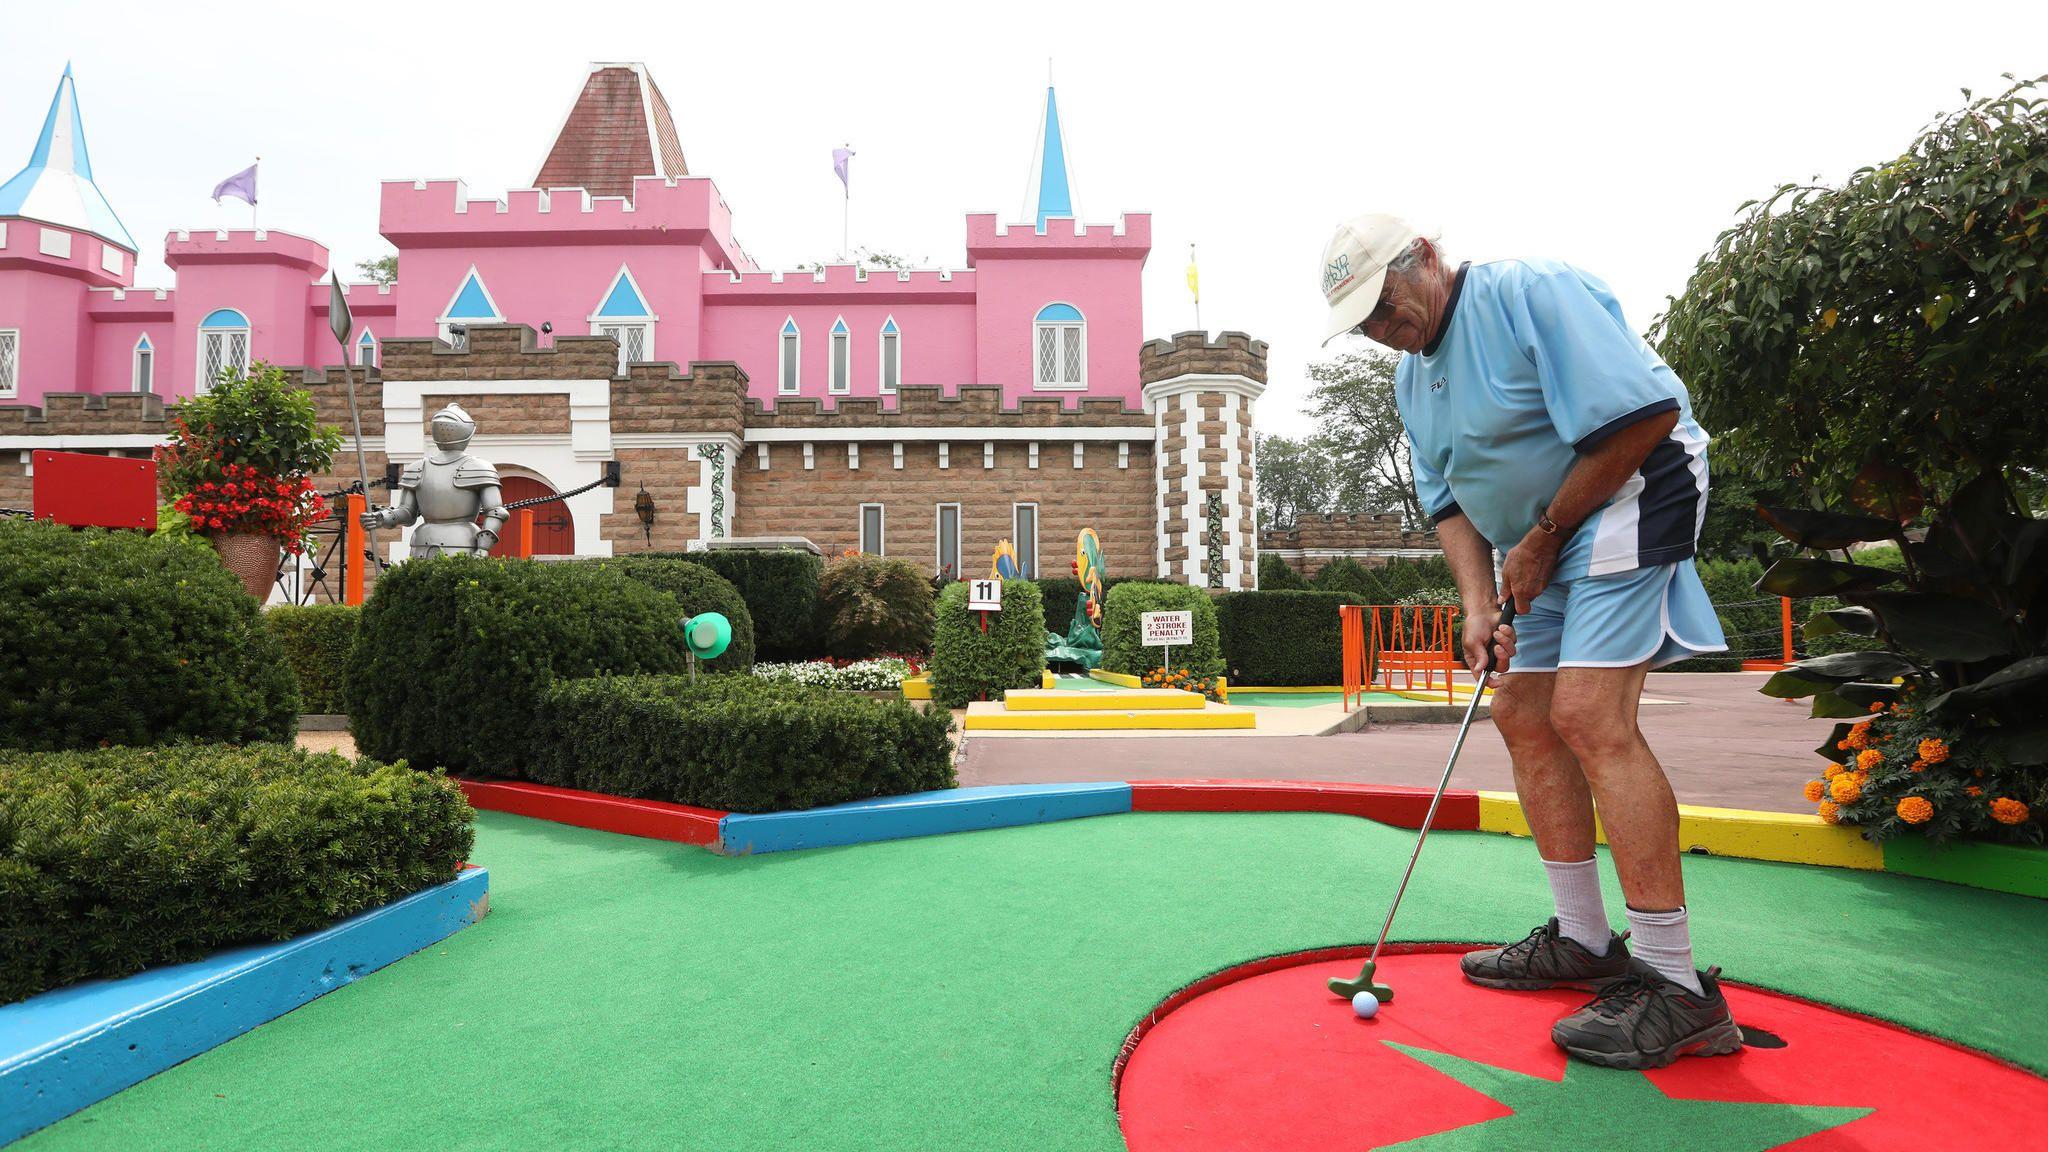 Remembering Gus Boznos The Par King Creator Who Made Miniature Golf Magic Golf Set Miniature Golf Course Miniature Golf